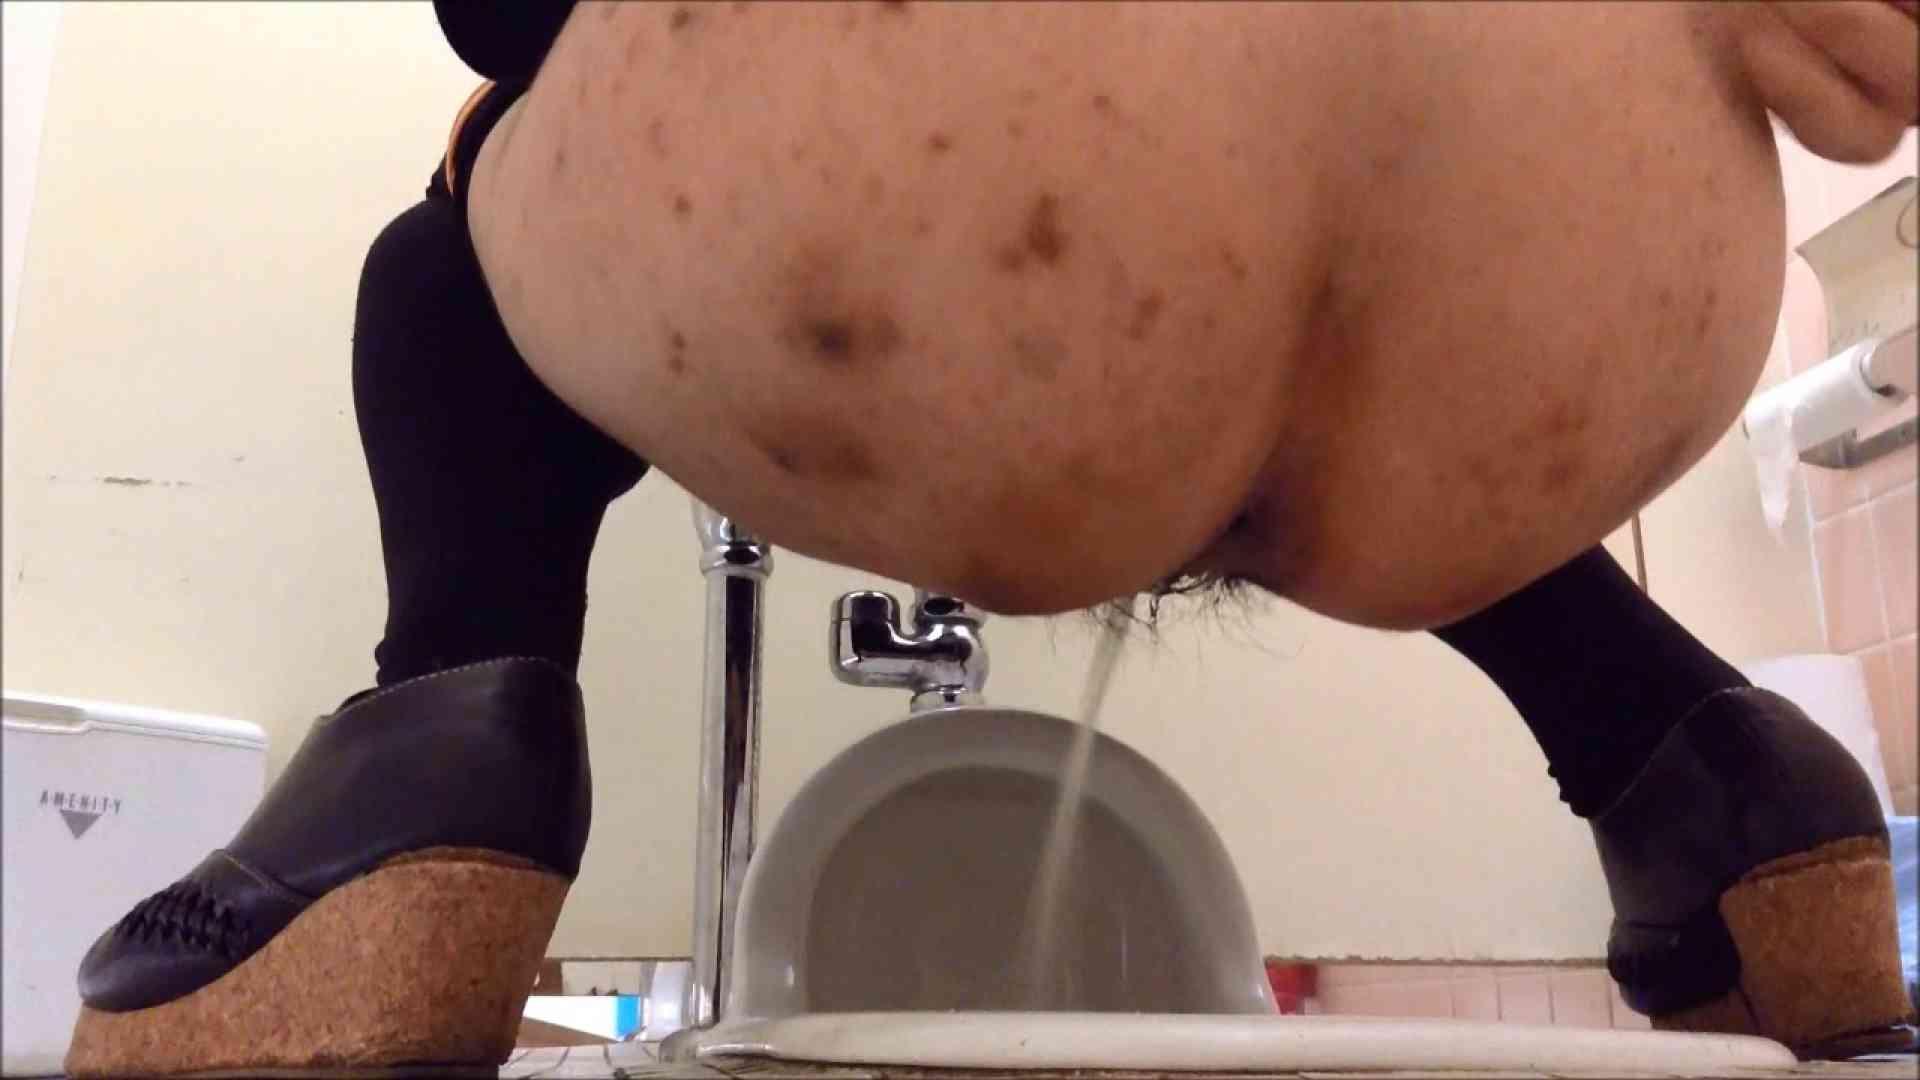 某有名大学女性洗面所 vol.06 OLのボディ オメコ無修正動画無料 74PIX 44